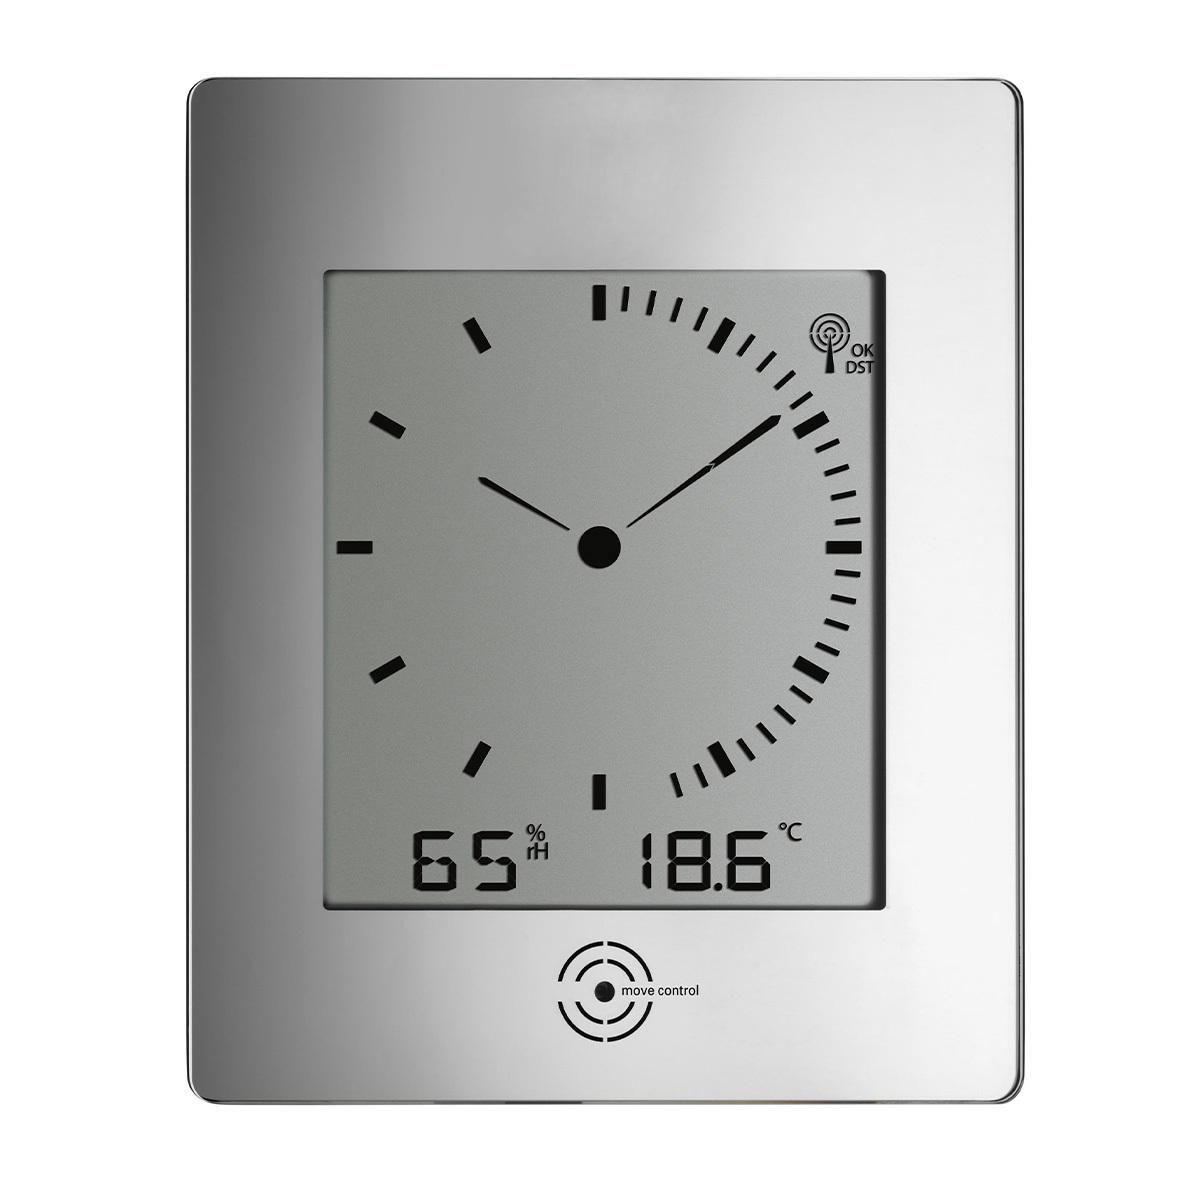 60-4507-digitale-funk-wanduhr-mit-analogem-zifferblatt-raumklima-datum-ansicht2-1200x1200px.jpg